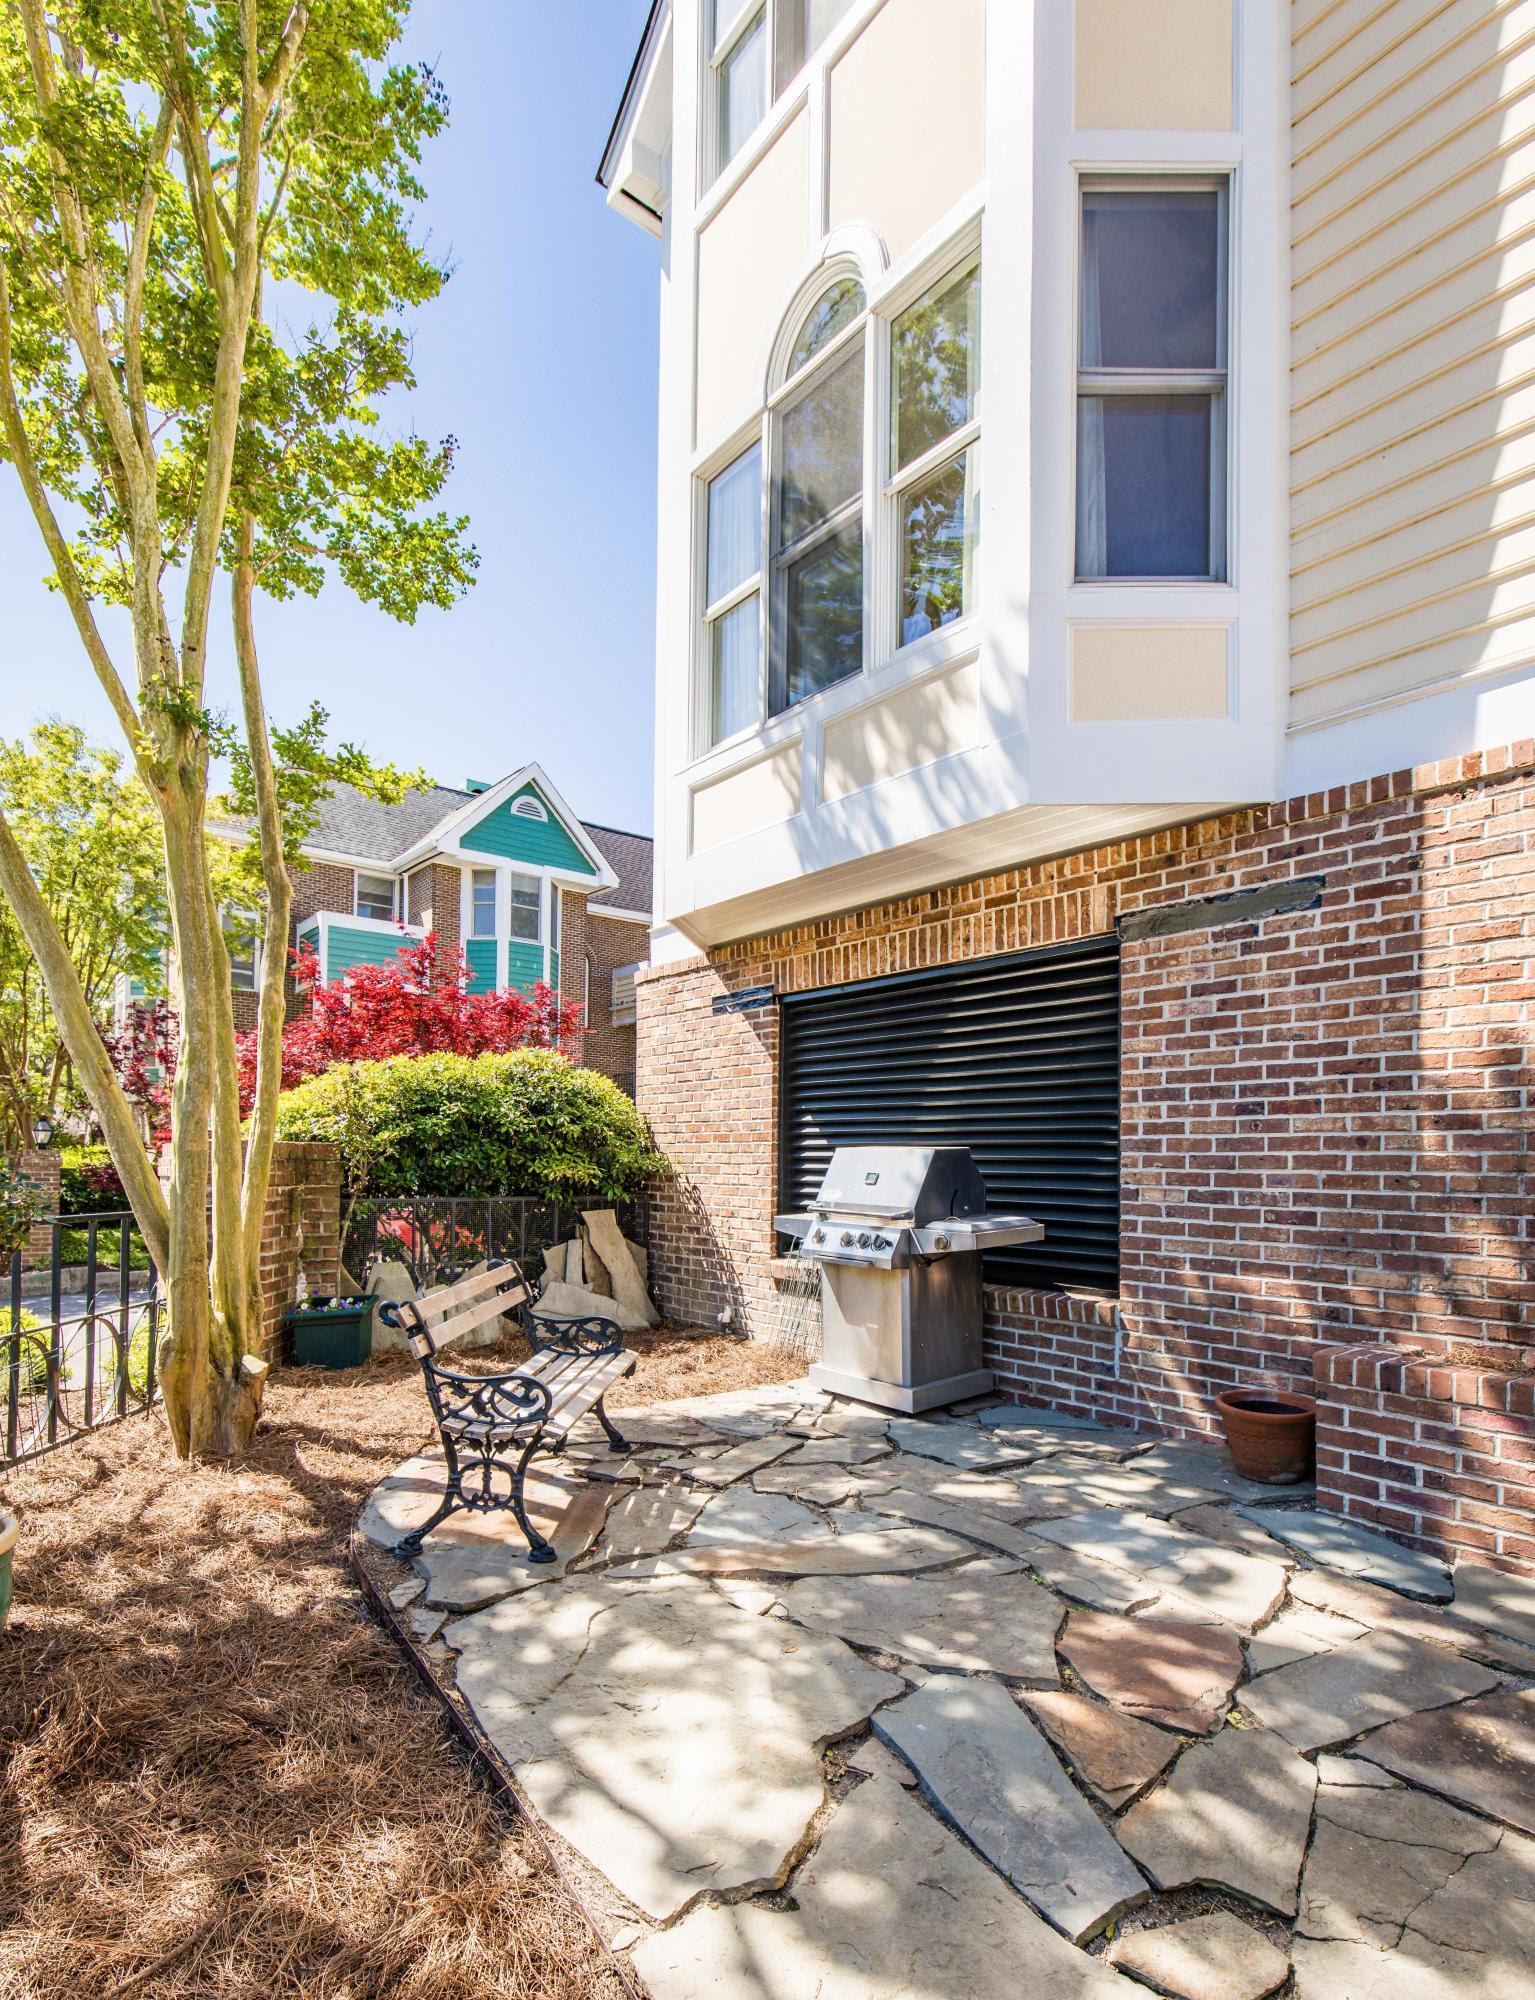 Harleston Village Homes For Sale - 39 Harleston, Charleston, SC - 29